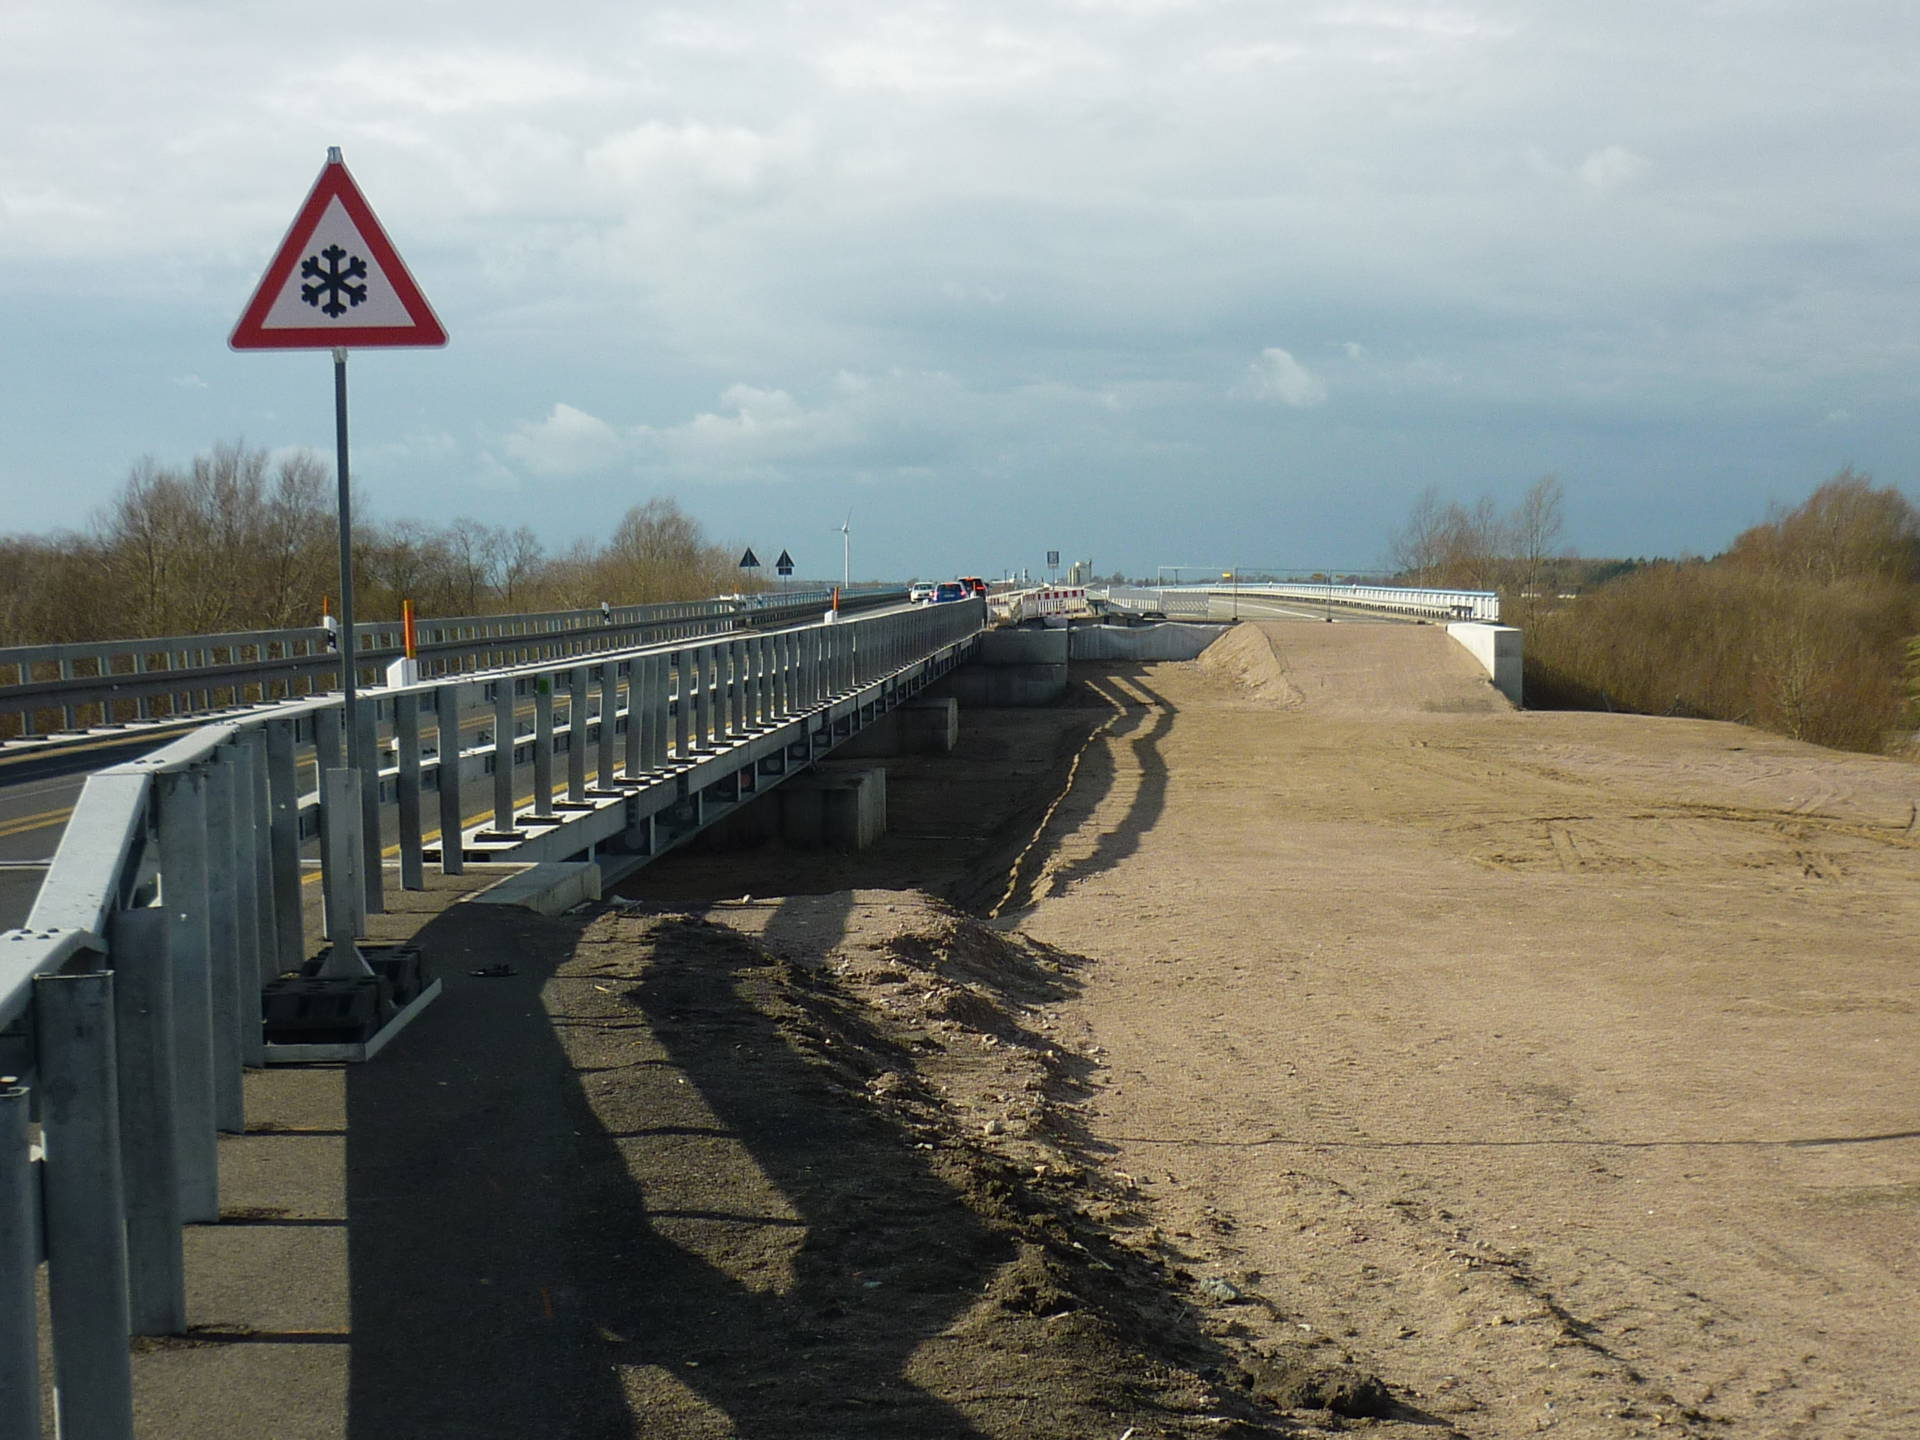 Foto BAB A20 Behelfsbrücke Ost